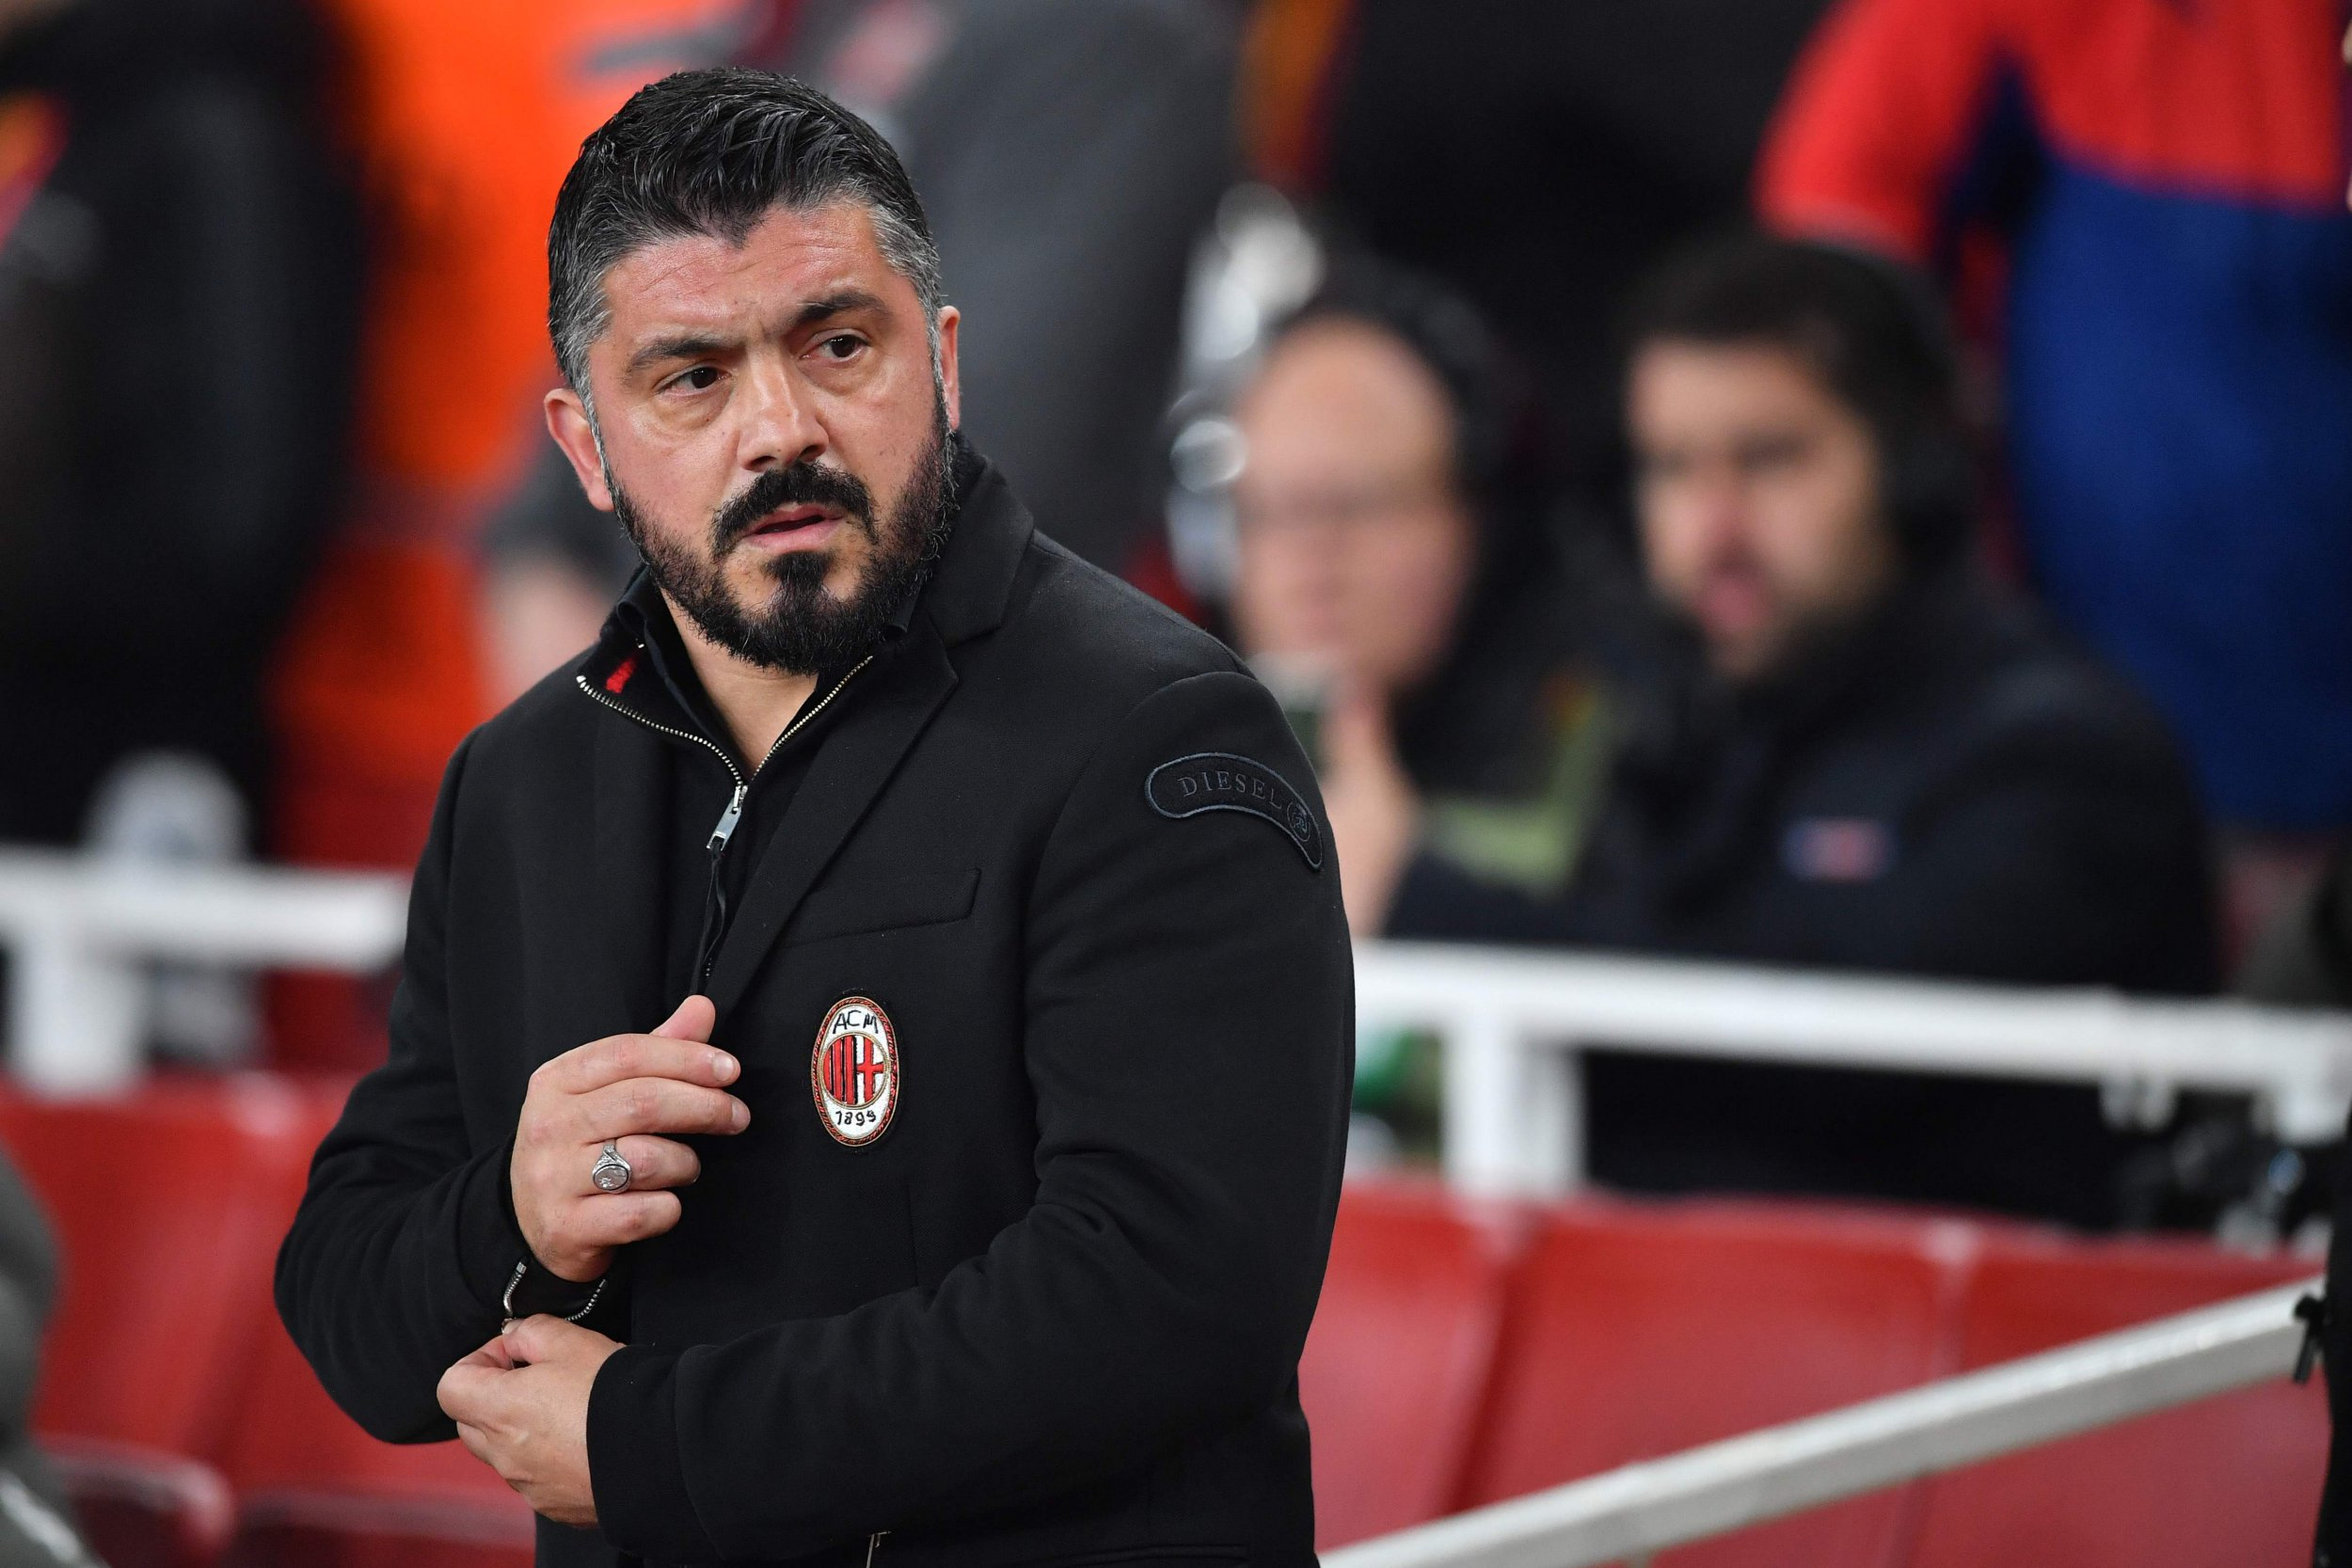 Video: Gennaro Gattuso rages over Danny Welbeck dive during Arsenal v AC Milan tie